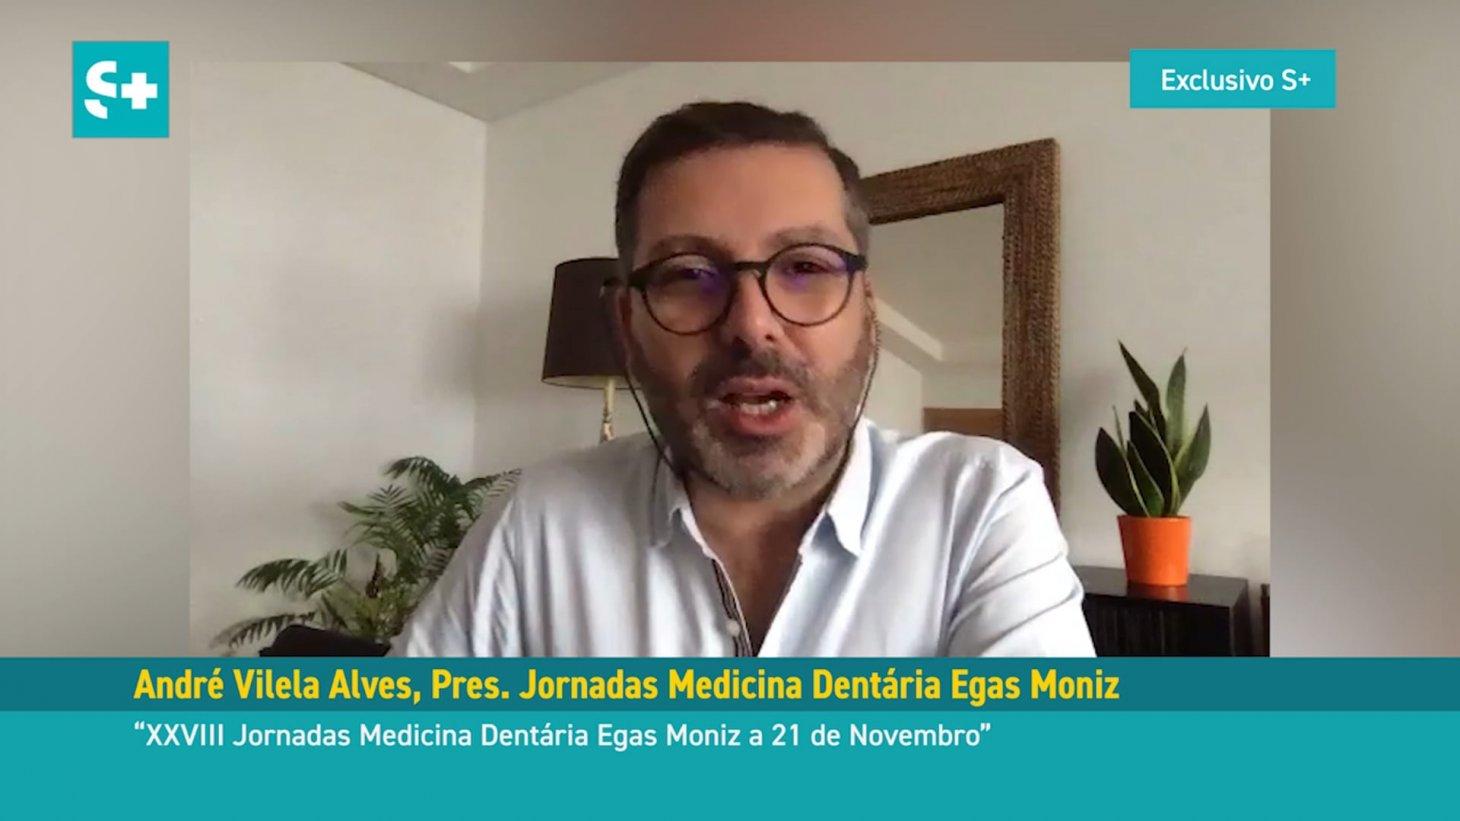 André Vilela Alves, Presidente das XXVIII Jornadas Medicina Dentária Egas Moniz #01